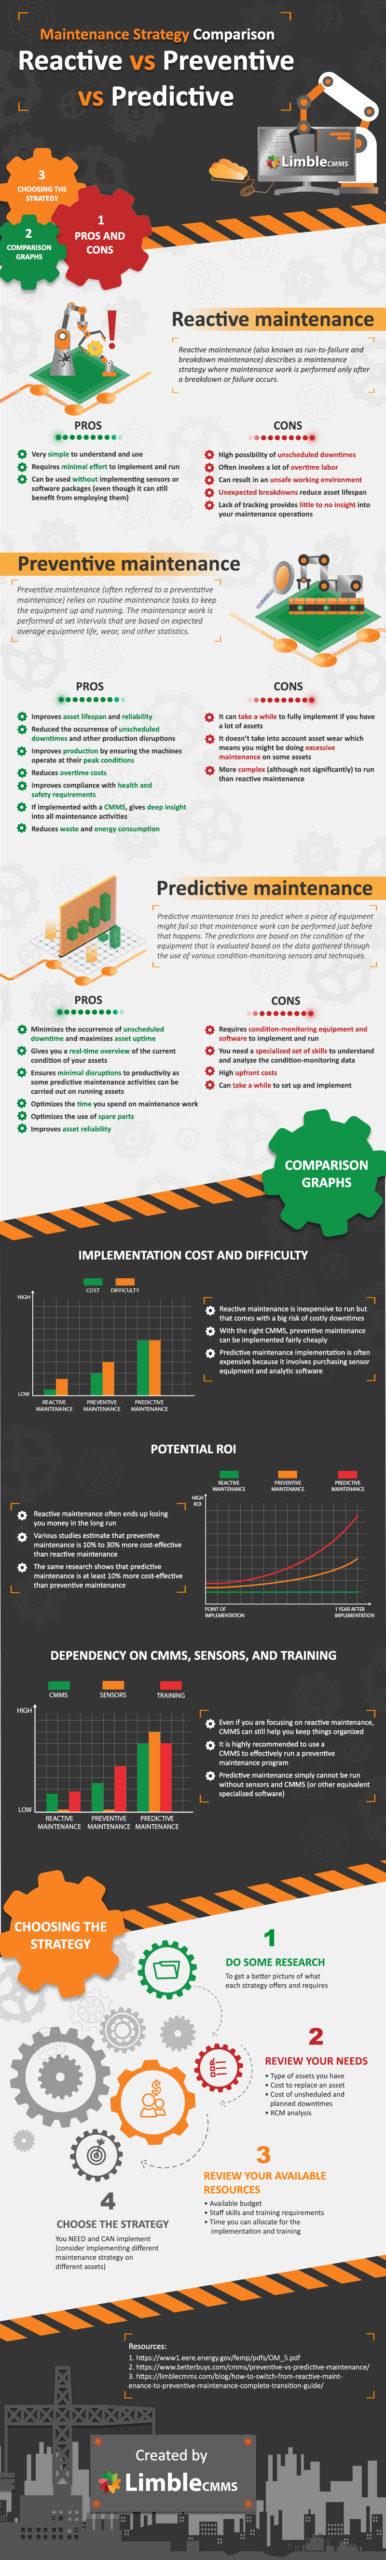 main types of maintenance strategies